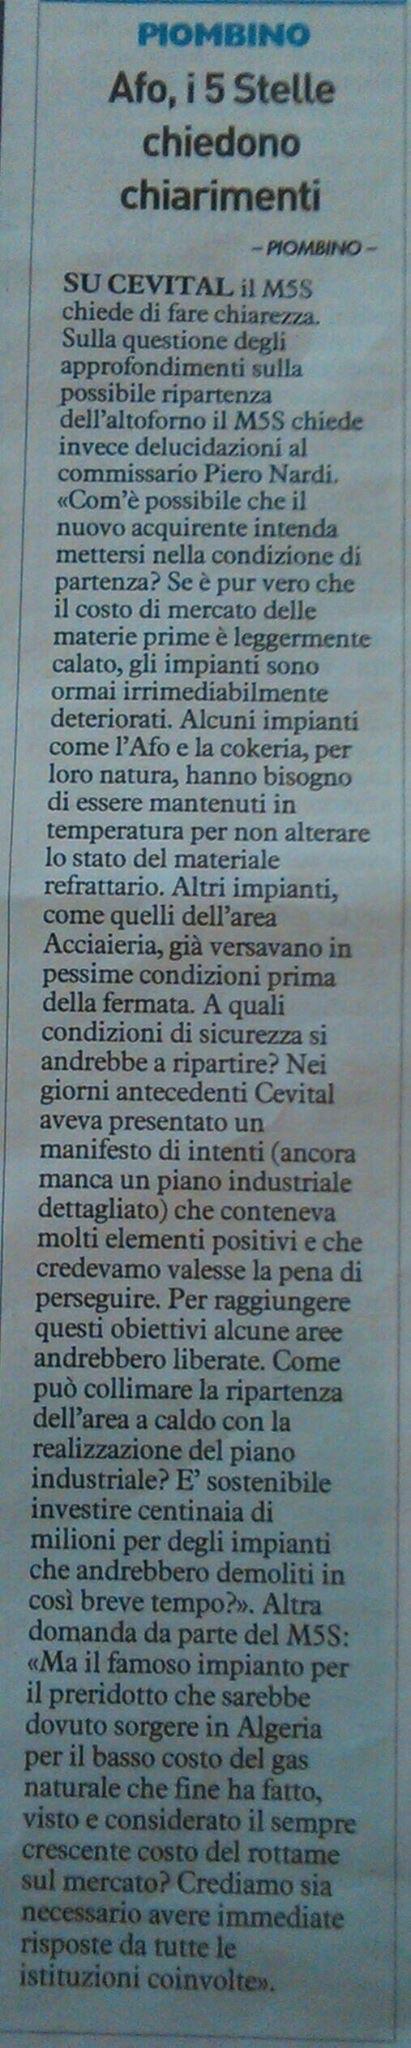 Dal Tirreno, 22/02/2015